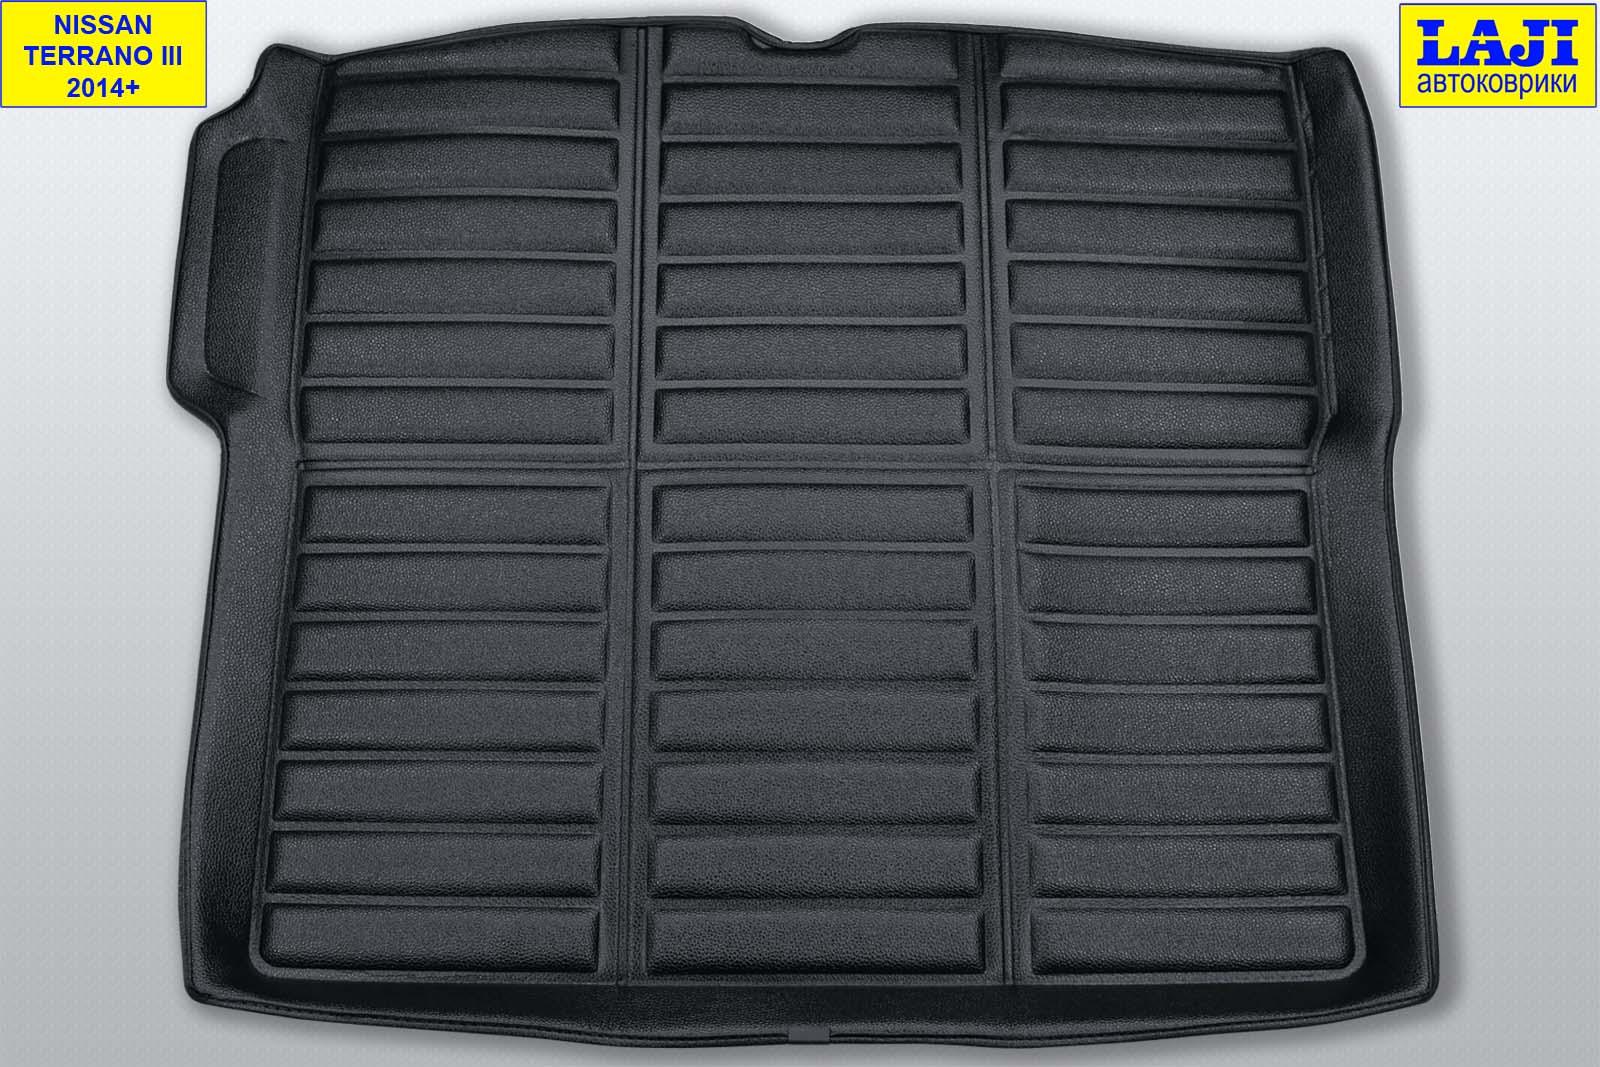 3D коврик в багажник Nissan Terrano D10 2010-н.в. 2